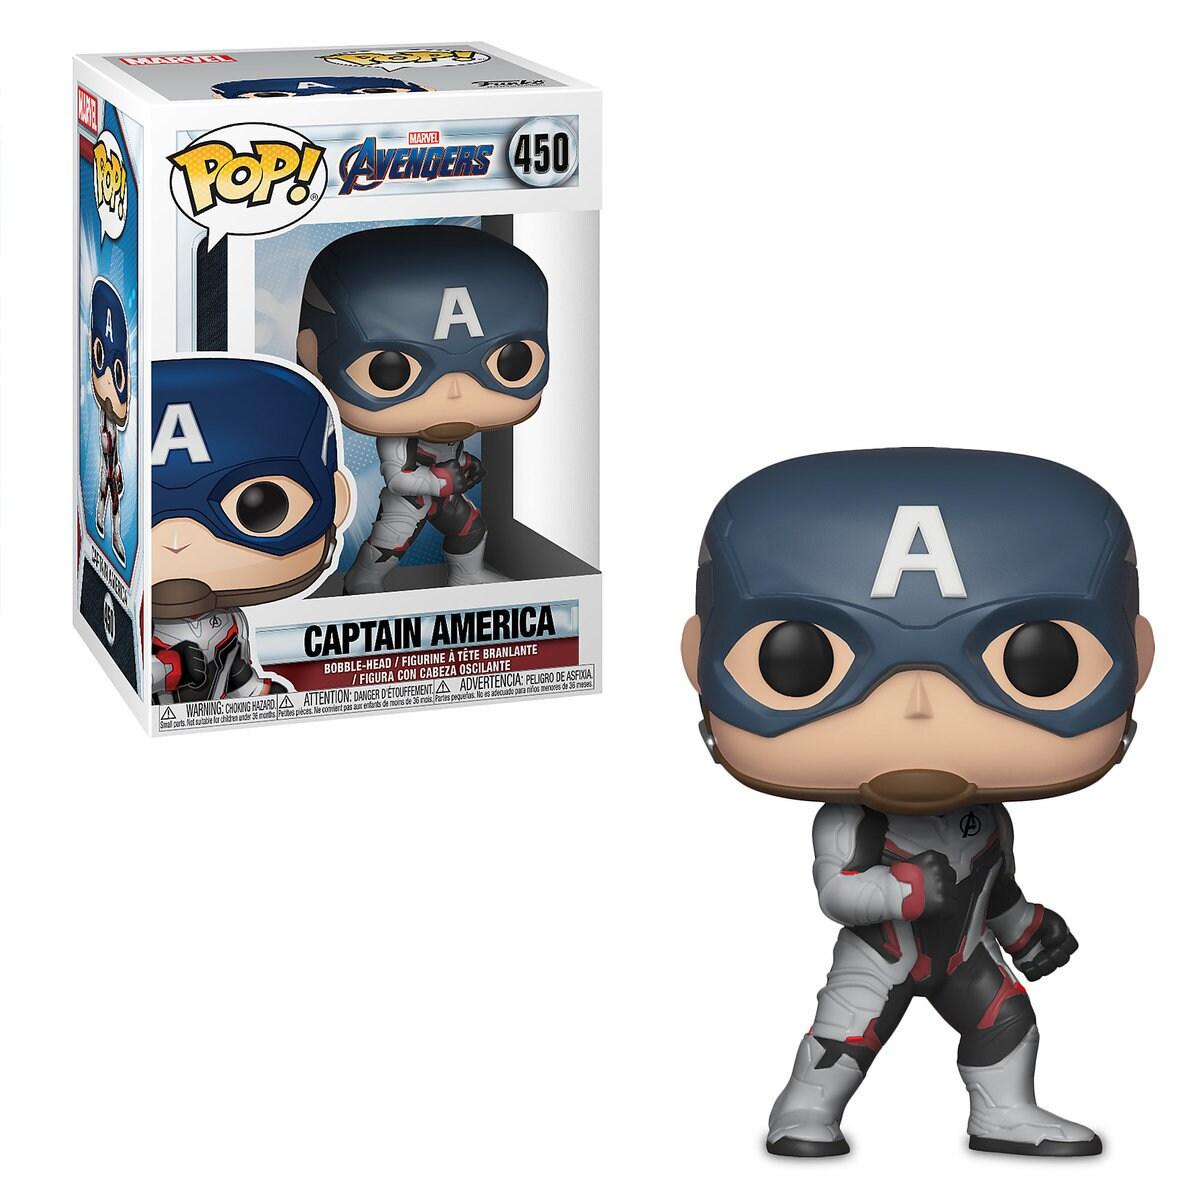 bad12f8c Product Image of Captain America Pop! Vinyl Bobble-Head Figure by Funko -  Marvel's